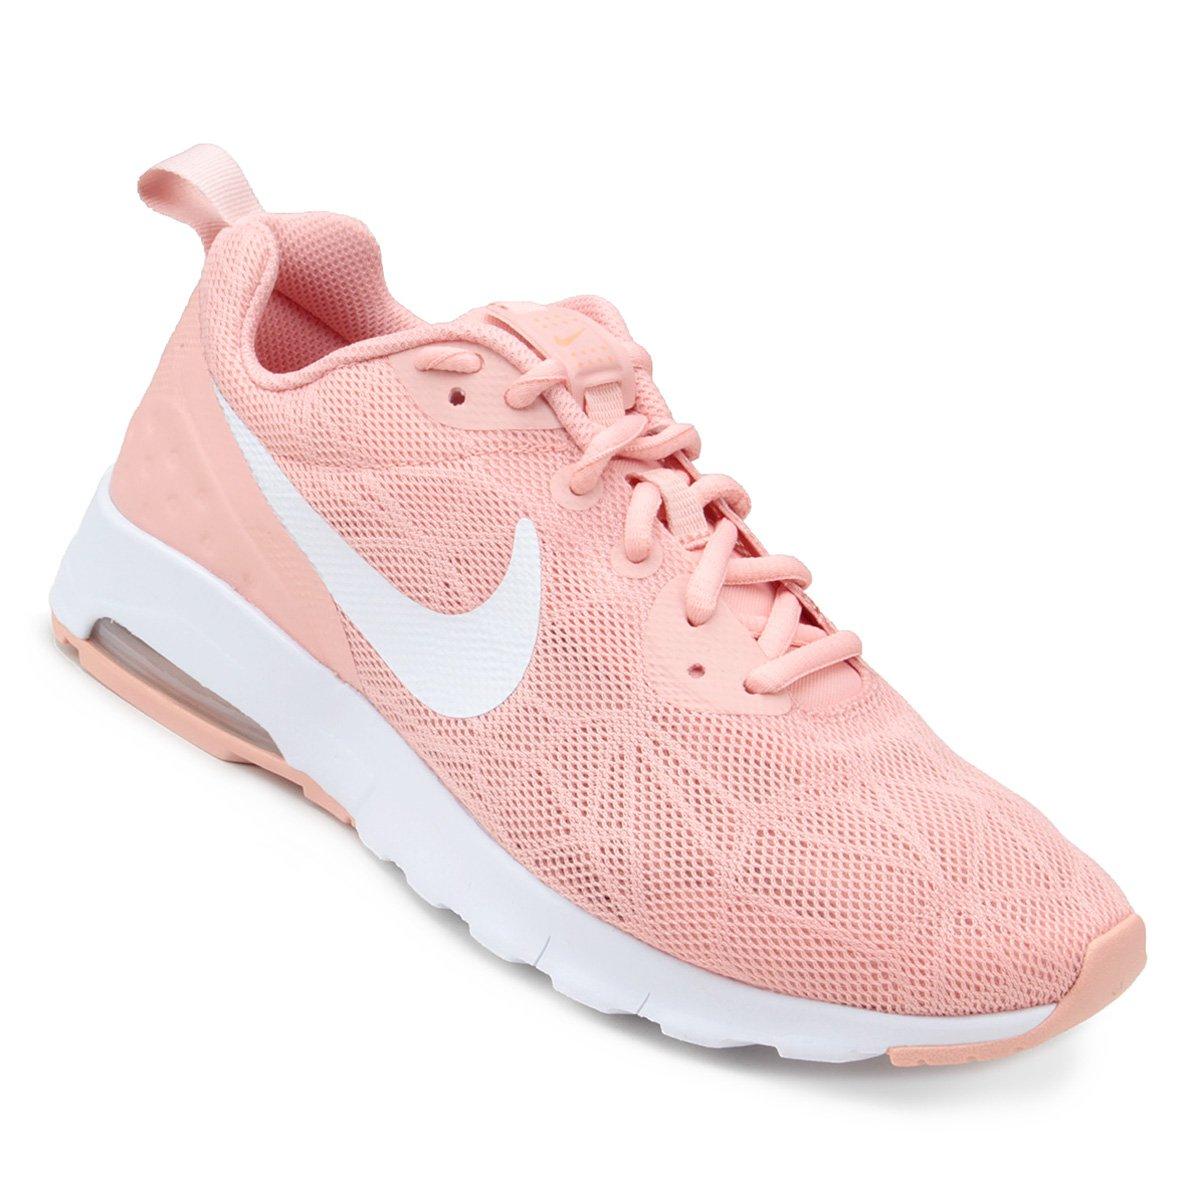 921cbc8d86481 Tênis Nike Air Max Motion Lw Se Feminino - Compre Agora   Netshoes